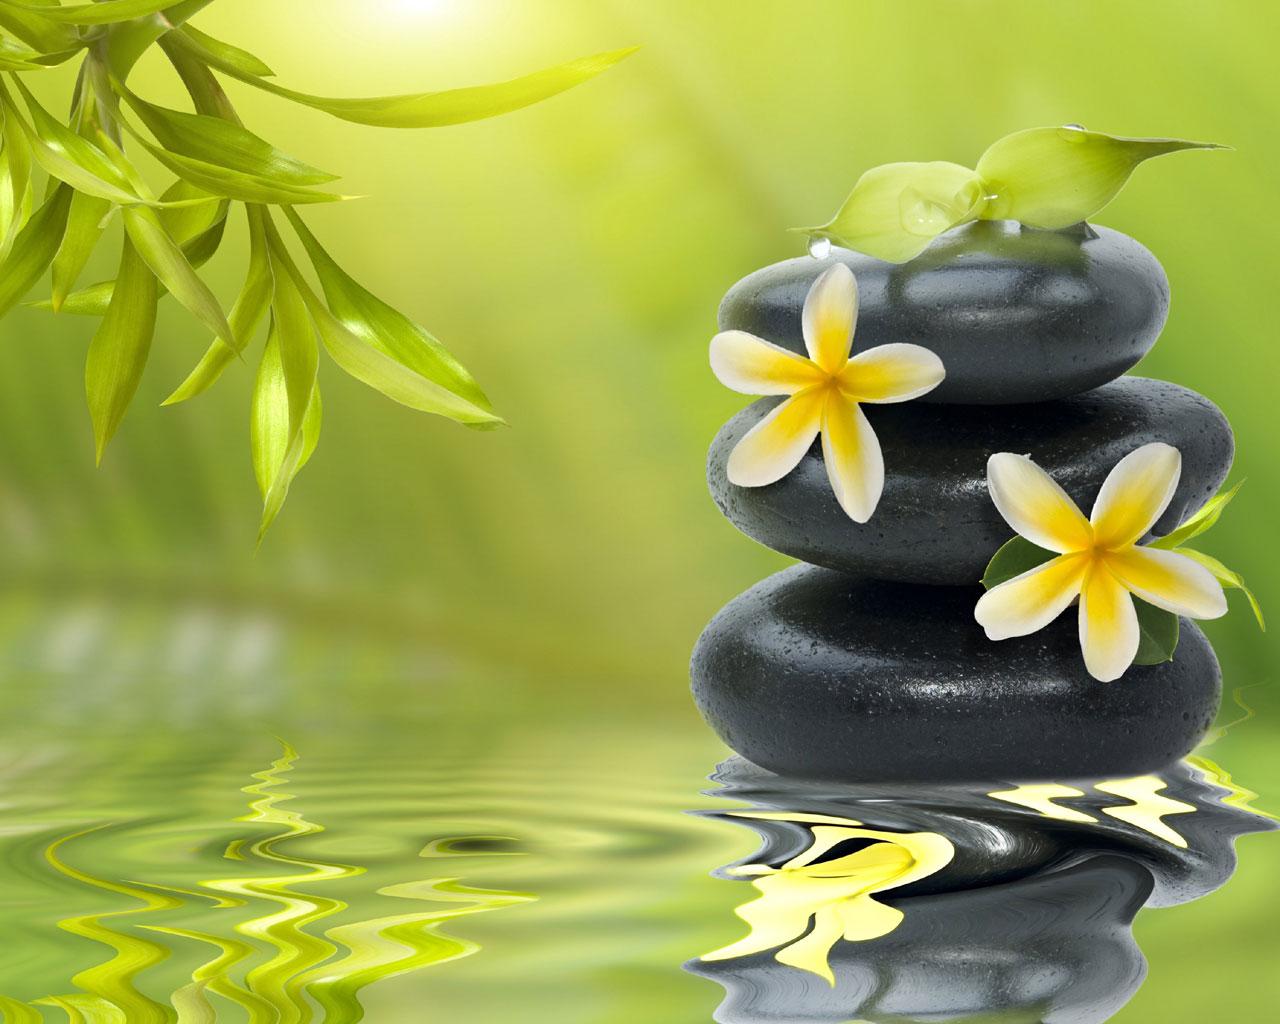 zen meditation wallpaper images